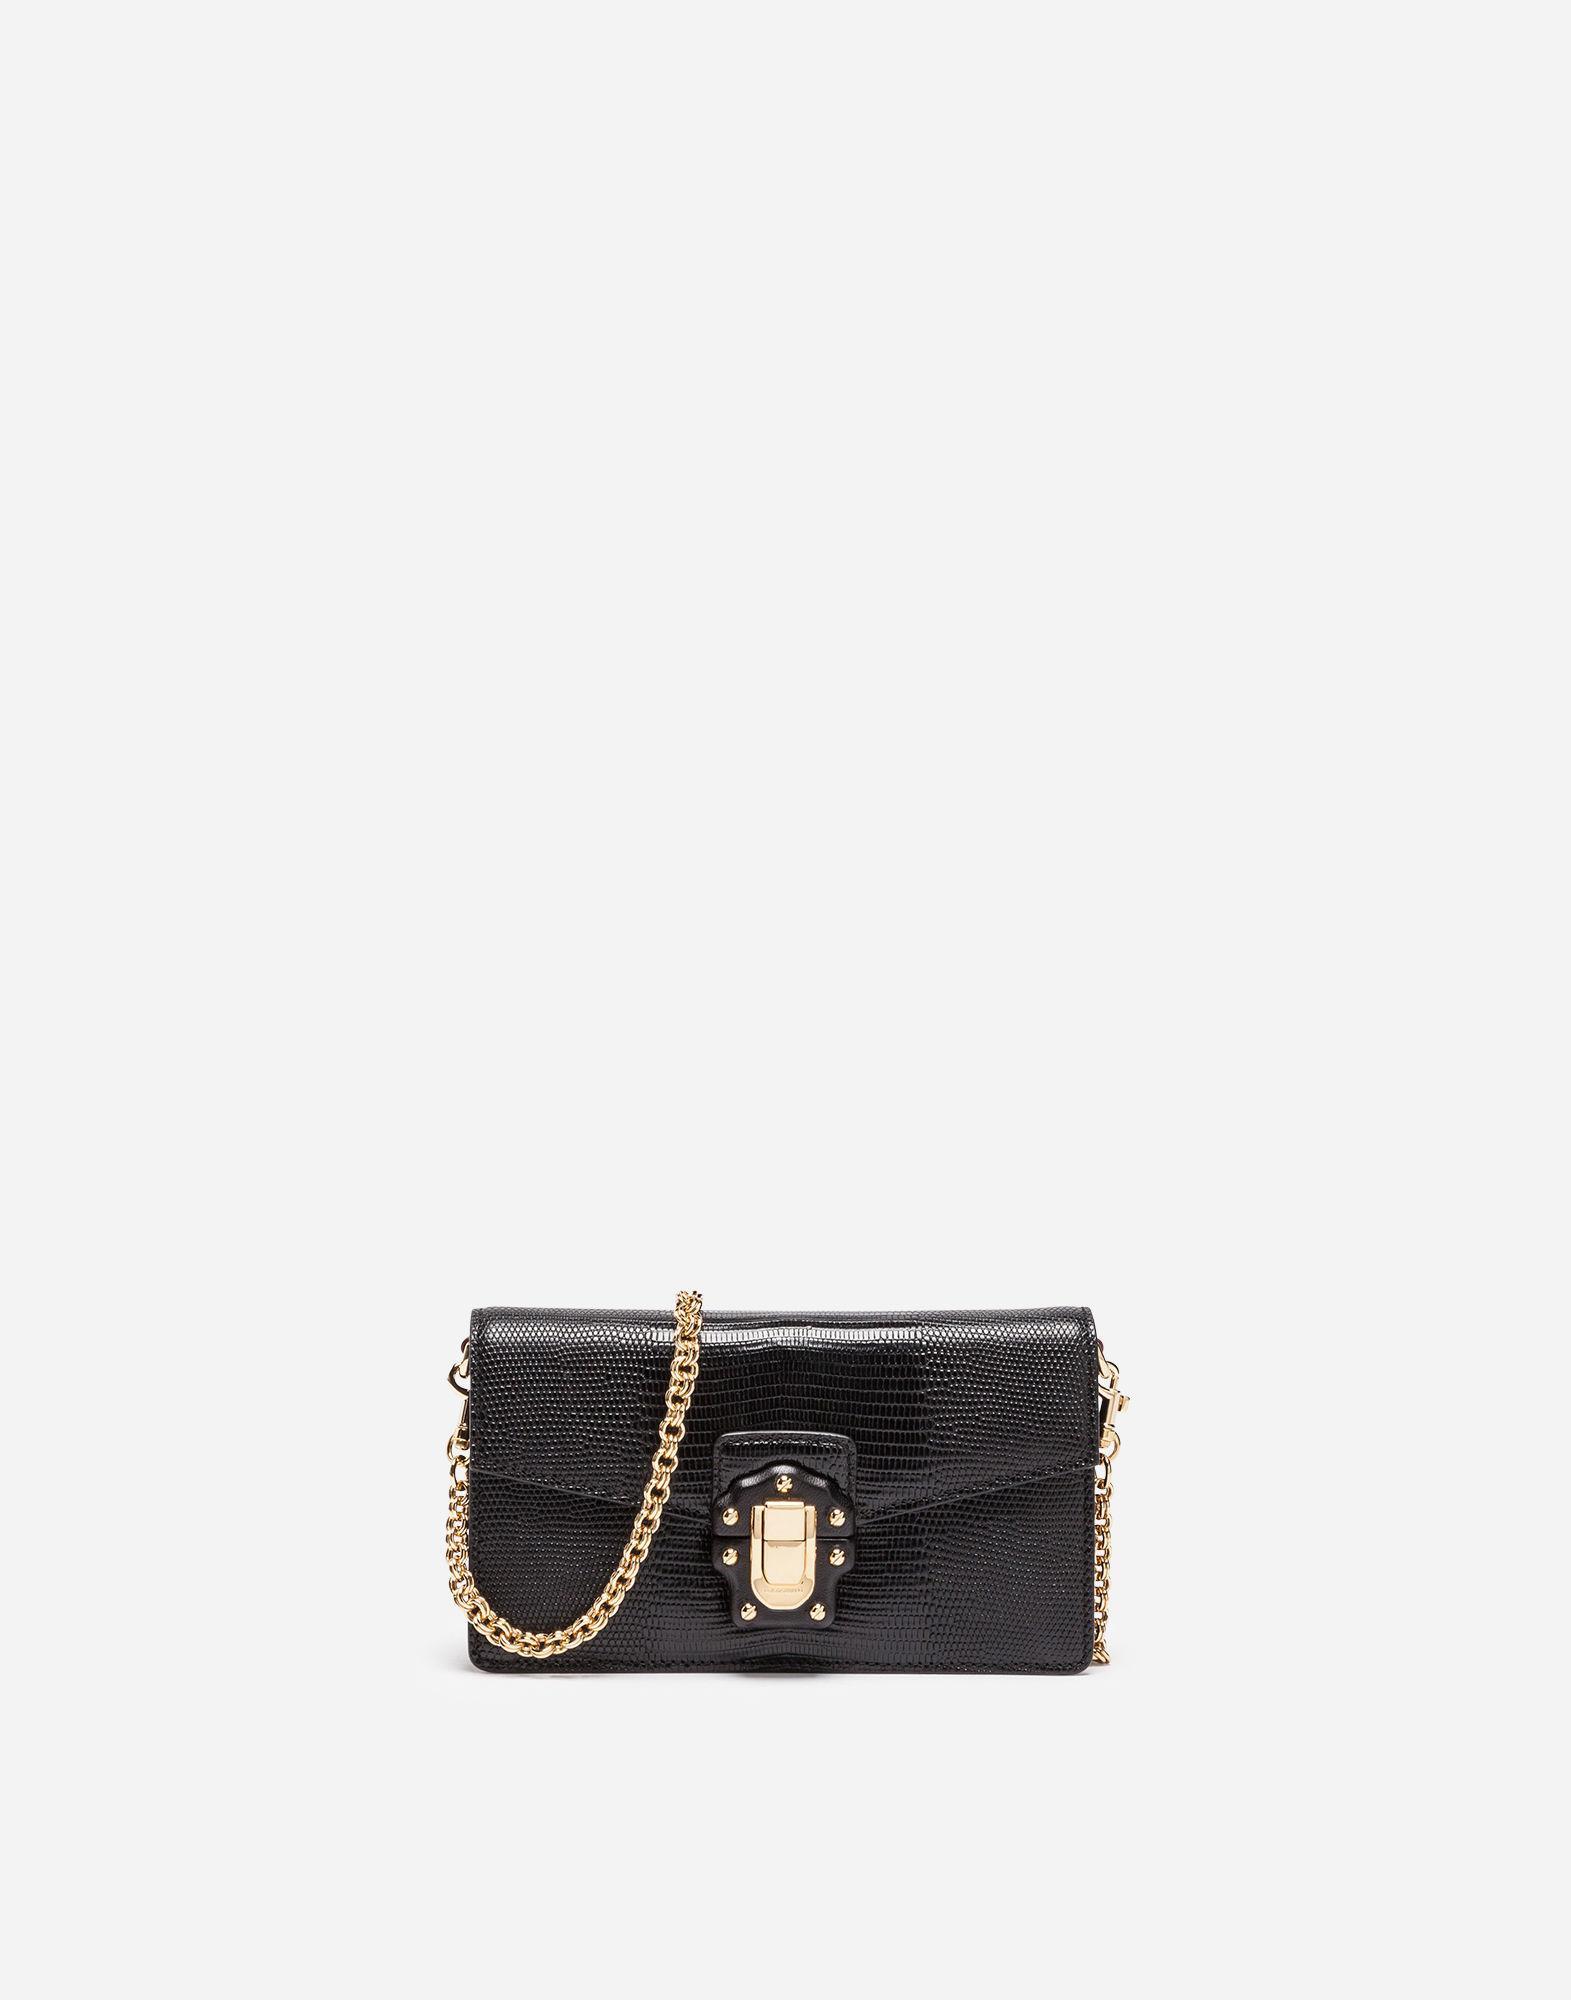 d4bad2f31e Dolce & Gabbana Mini Leather Lucia Bag in Black - Lyst